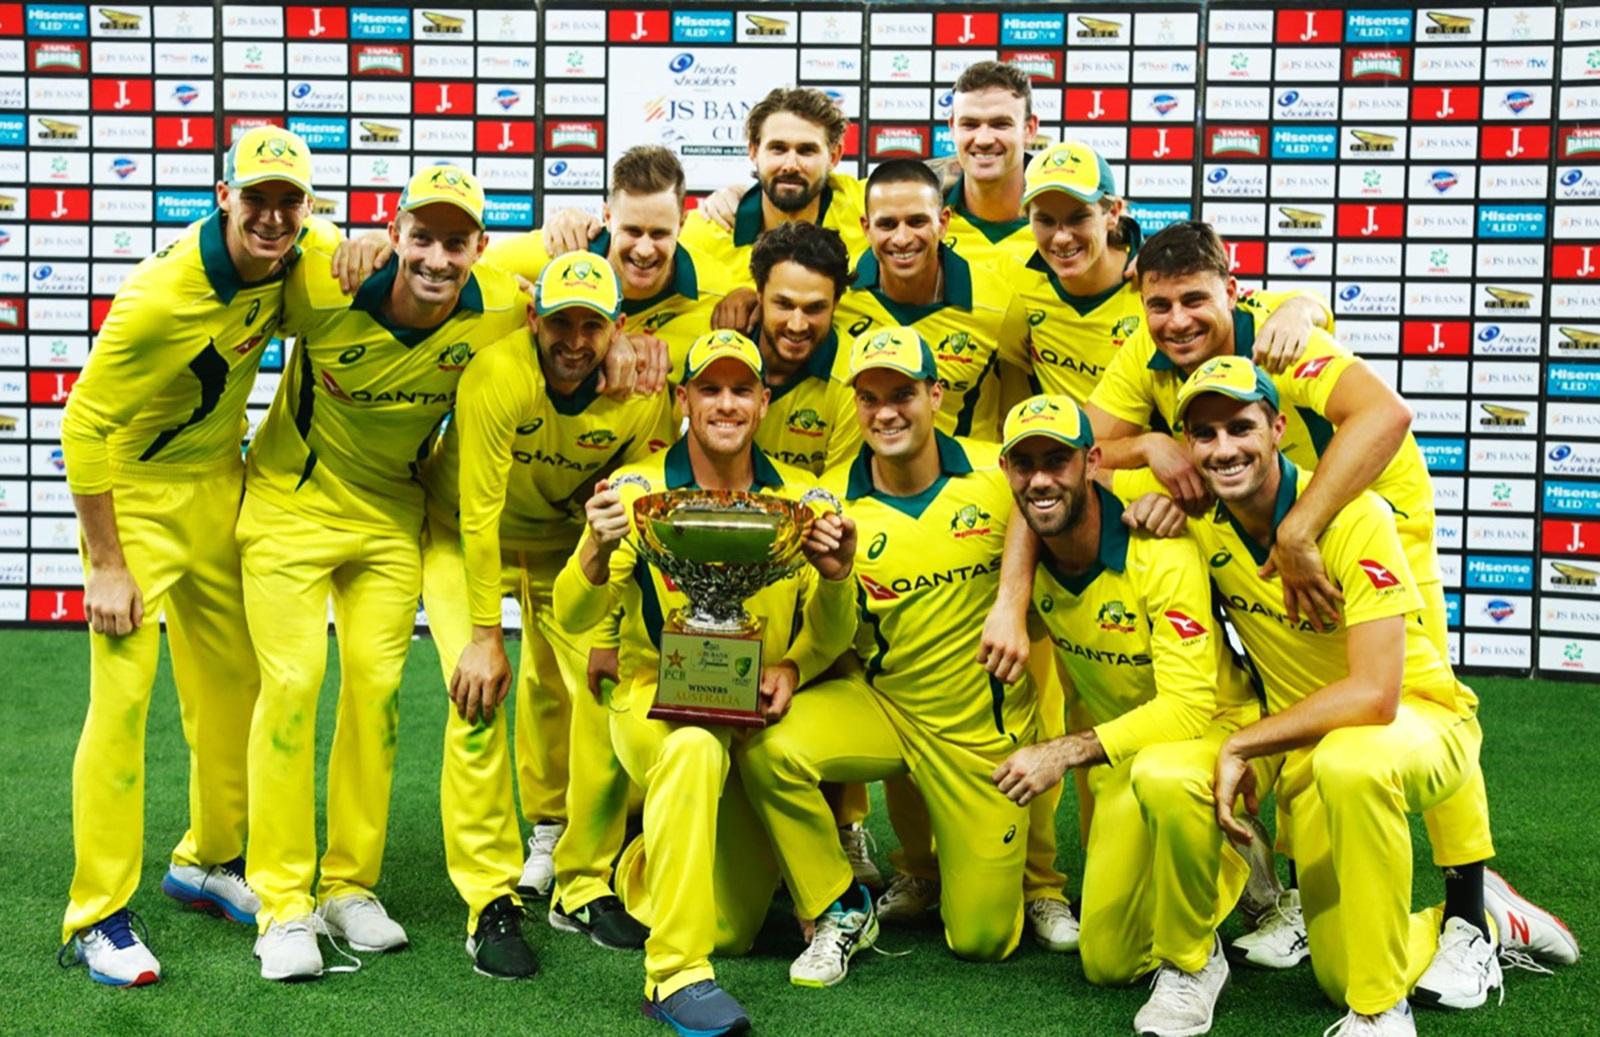 Whitewash! Aussies secure 5-0 sweep | cricket com au